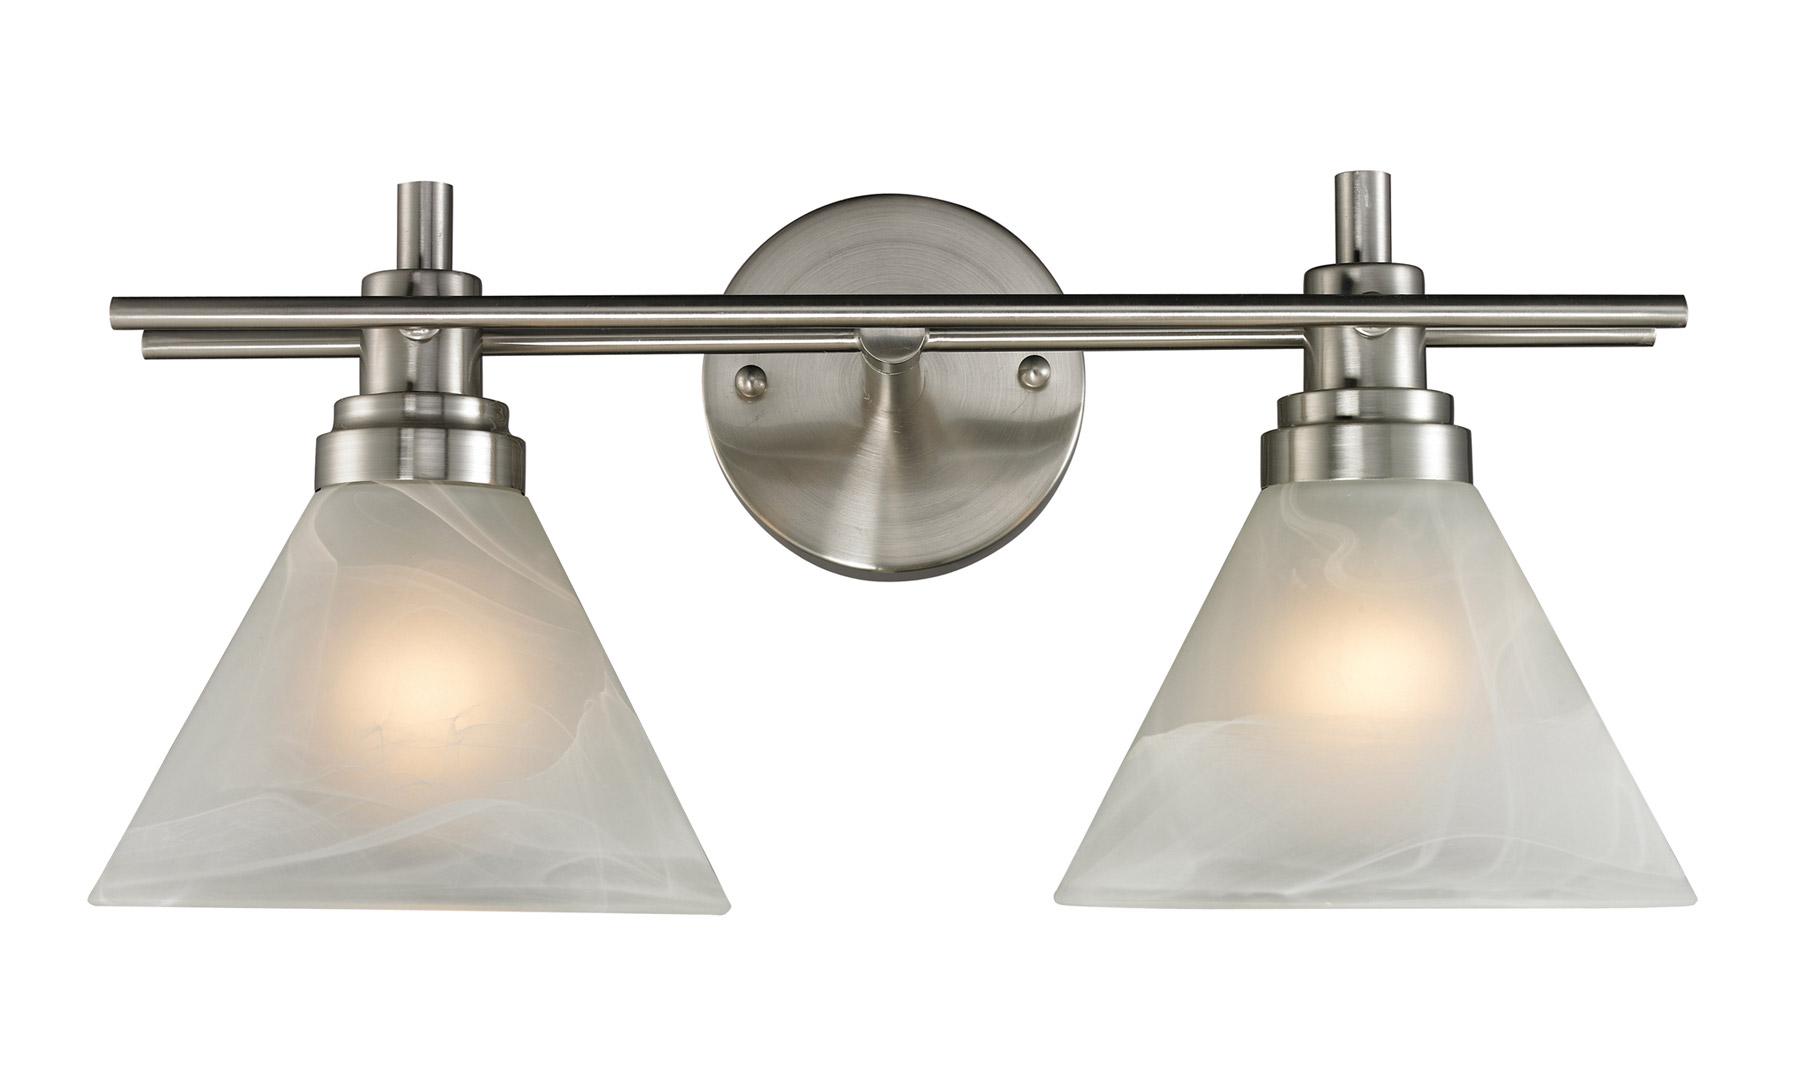 Elk lighting 11401 2 pemberton vanity light for Elk bathroom lighting